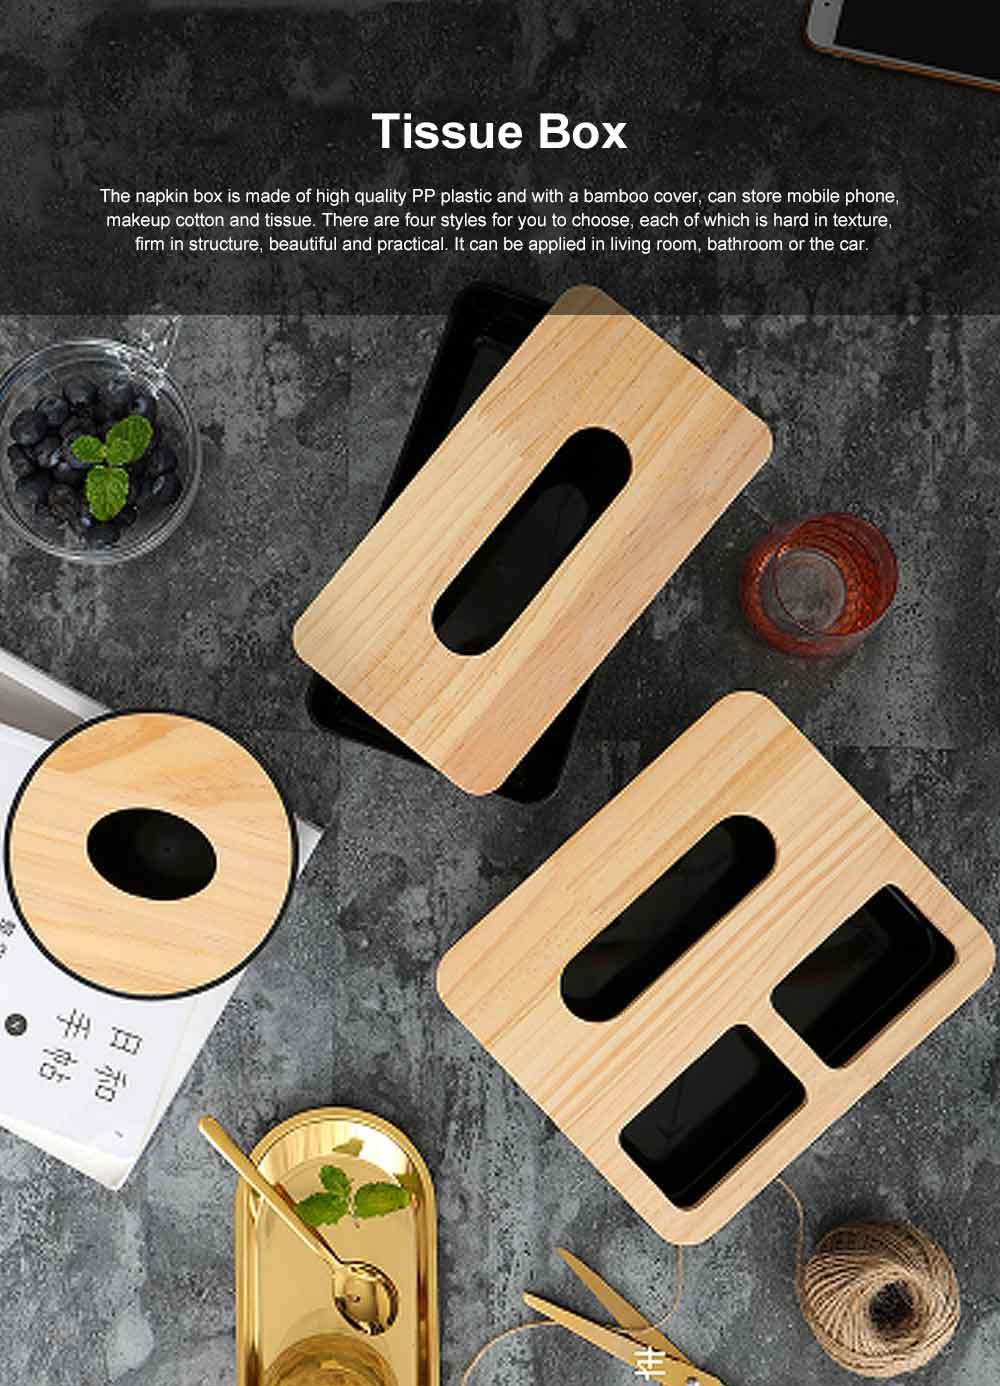 Tissue Box Wooden Cover Mobile Phone Holder, Makeup Cotton Box, On-board Black Tissue Box for Living Room, Desktop Napkin Box 0